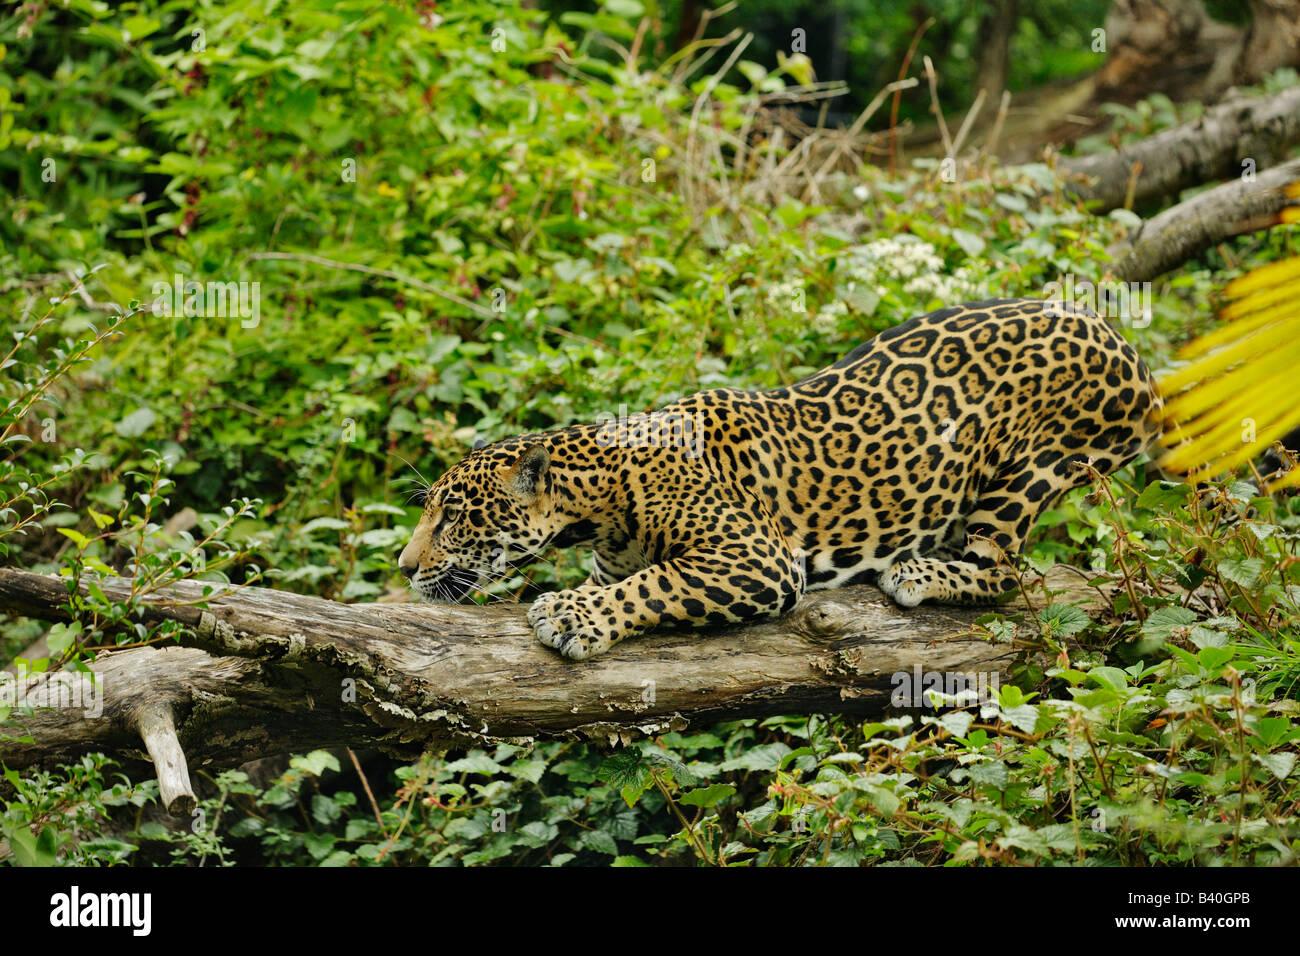 Alert jaguar on the prowl Note Captive subject - Stock Image